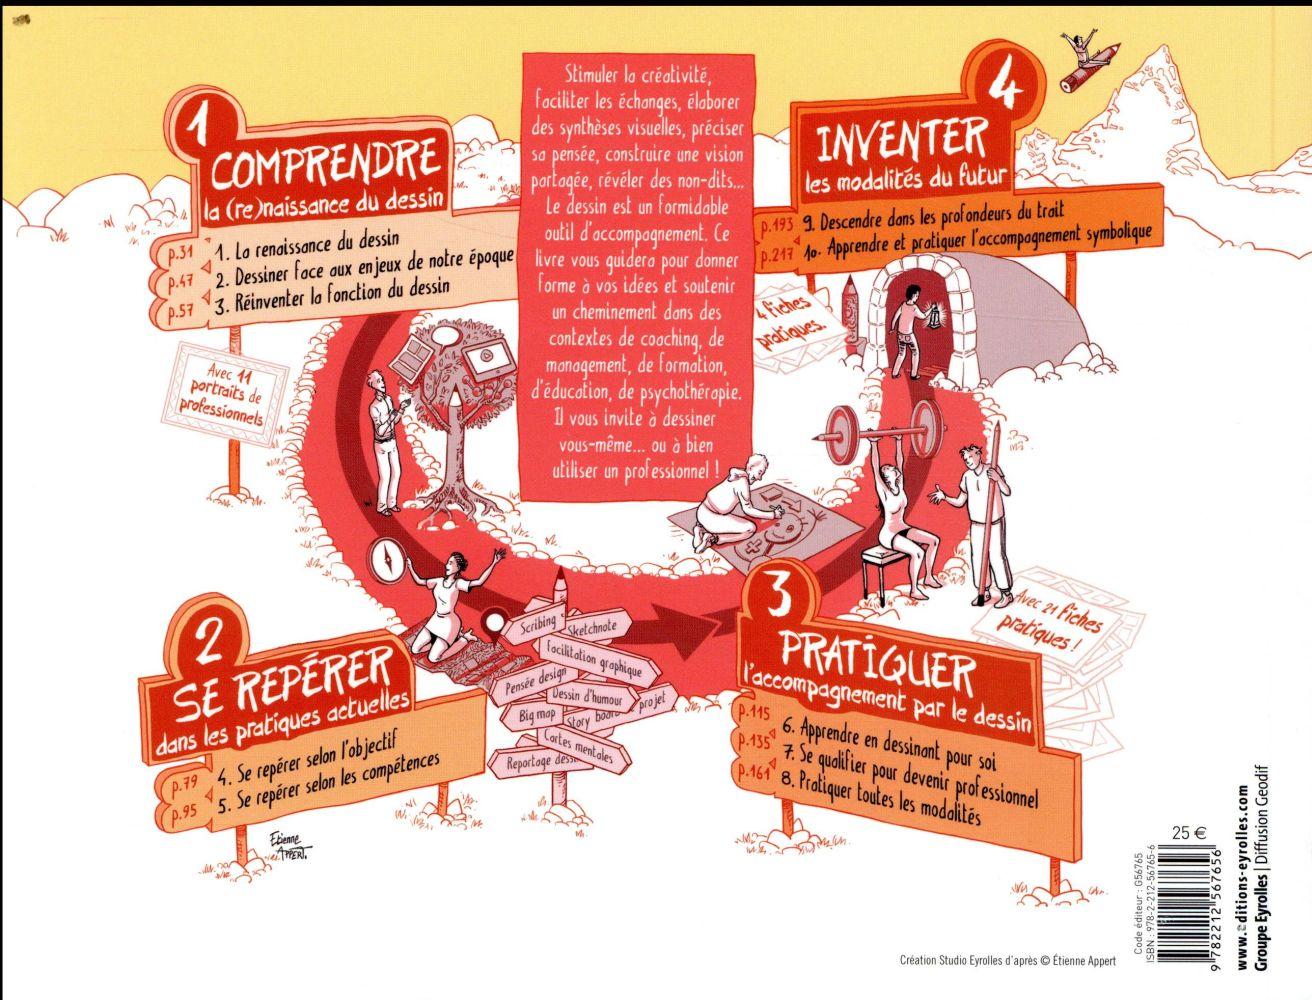 Penser... dessiner... révéler ! facilitation graphique, sketchnote, scribing, graphic, analyse, cartes mentales